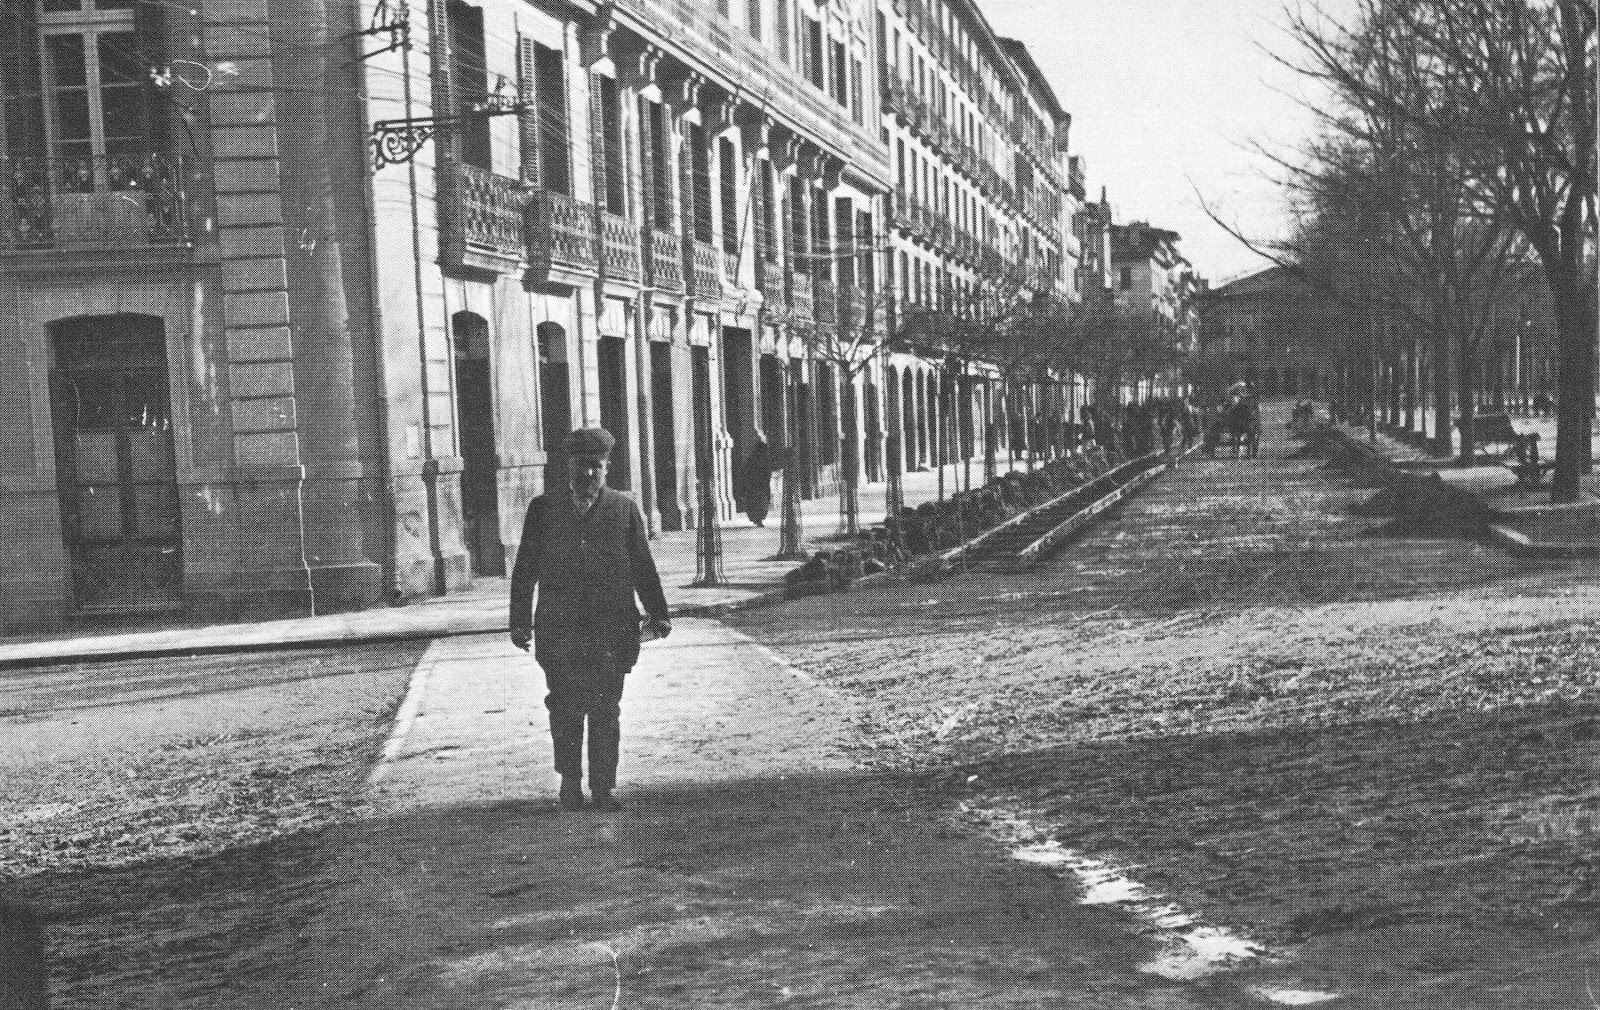 1911-CALLE  NAVAS  DE  TOLOSA-PASEO  SARASATE-colocando las vias del irati